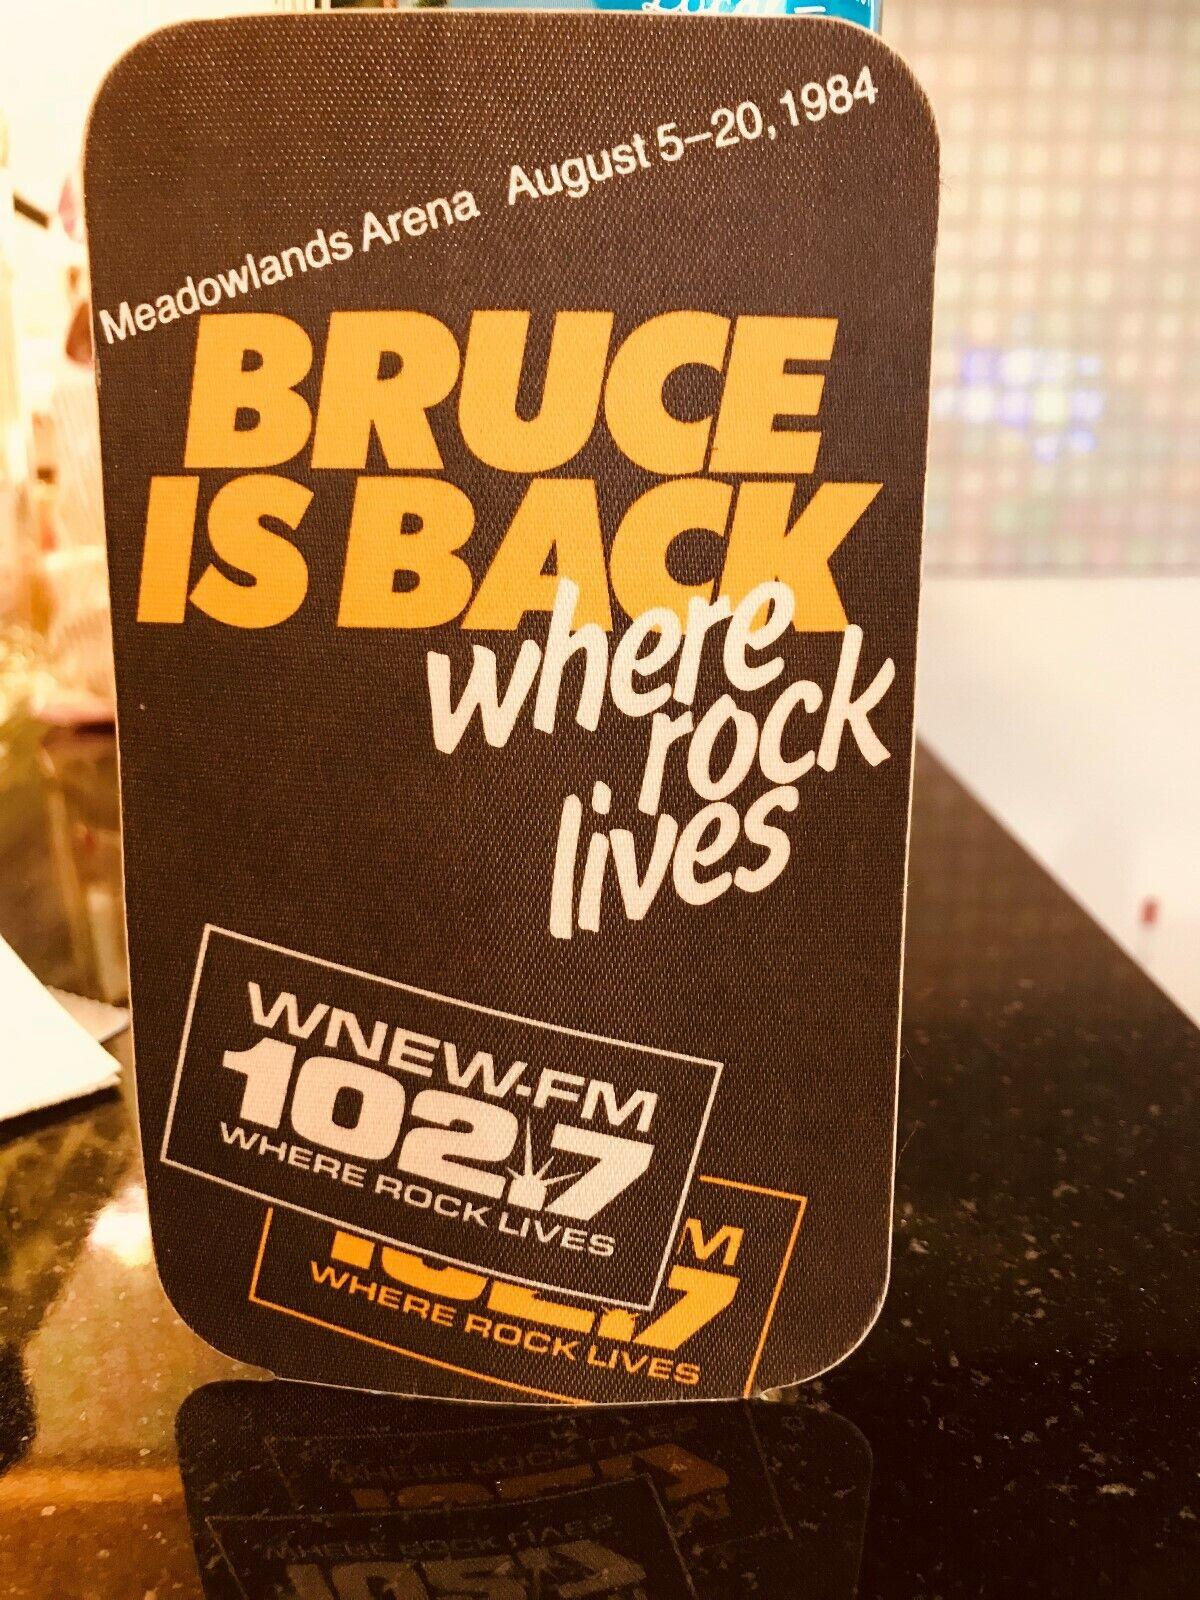 Bruce Springsteen WNEW FM 102.7 Concert Sticker Wplj 95.5 1984 Tour Radio Bumper - $15.00